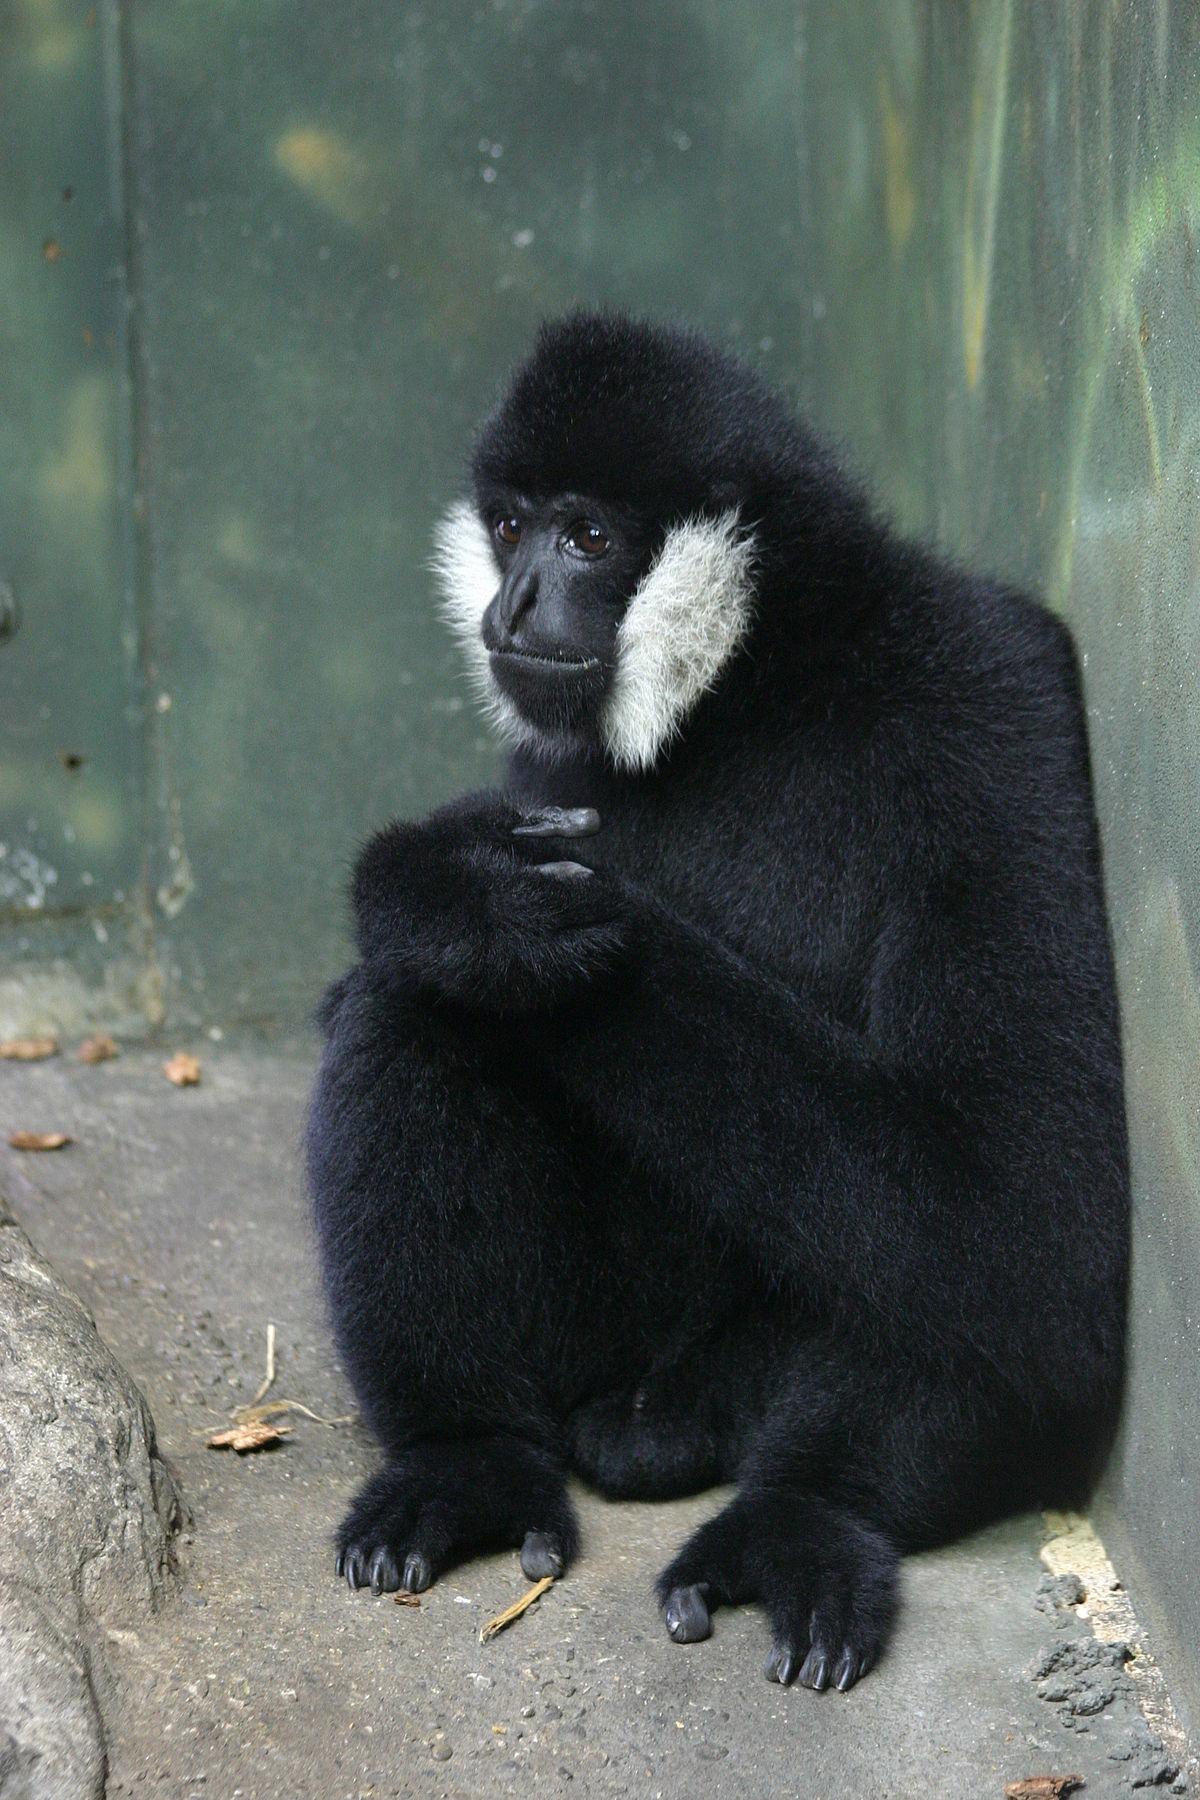 Northern white-cheeked gibbon - Wikipedia